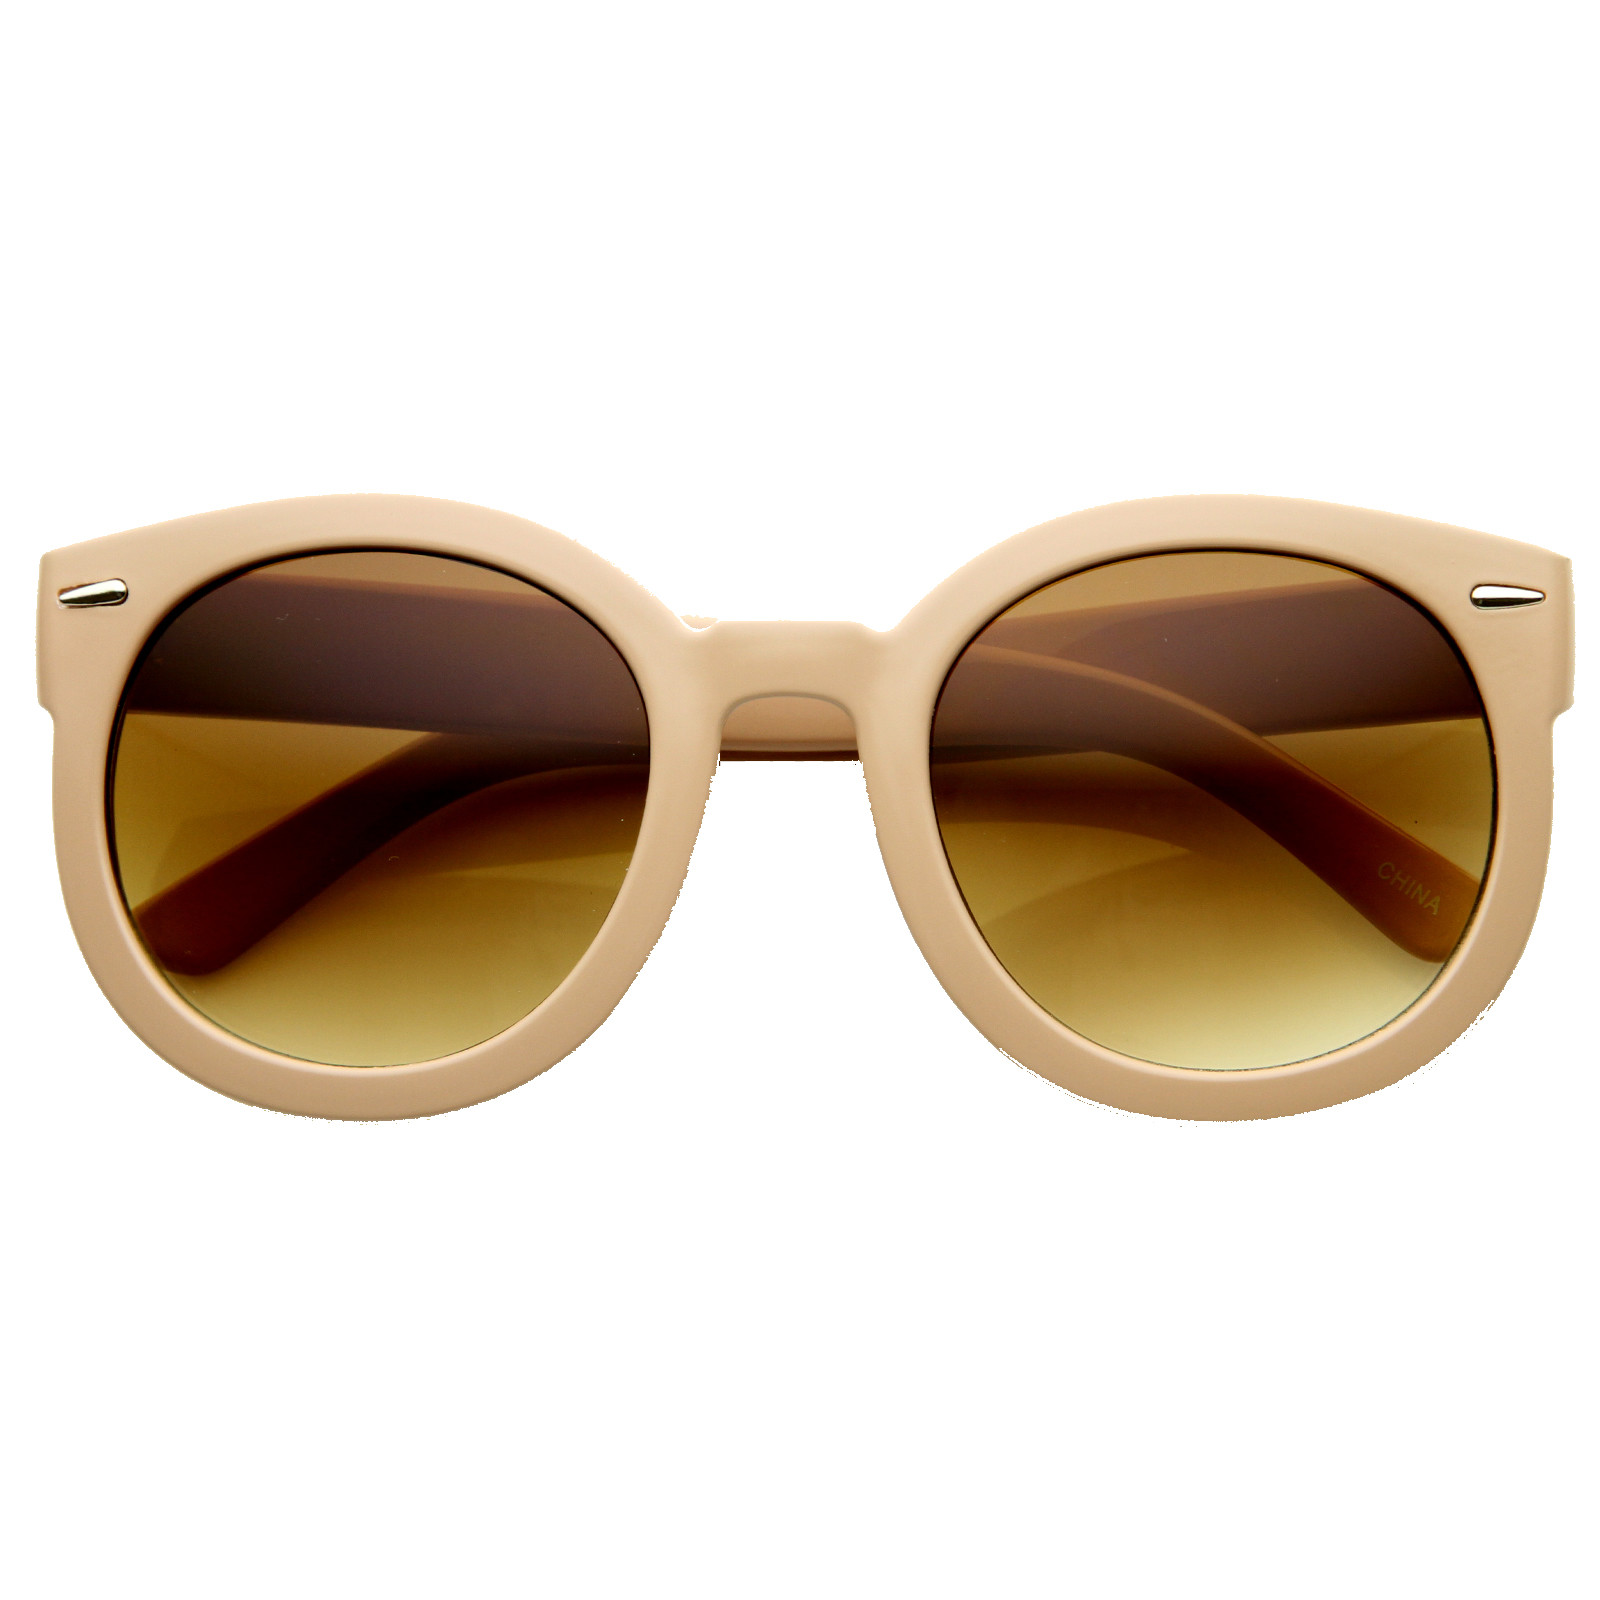 Womens Designer Round Oversize Retro Fashion Sunglasses 8623